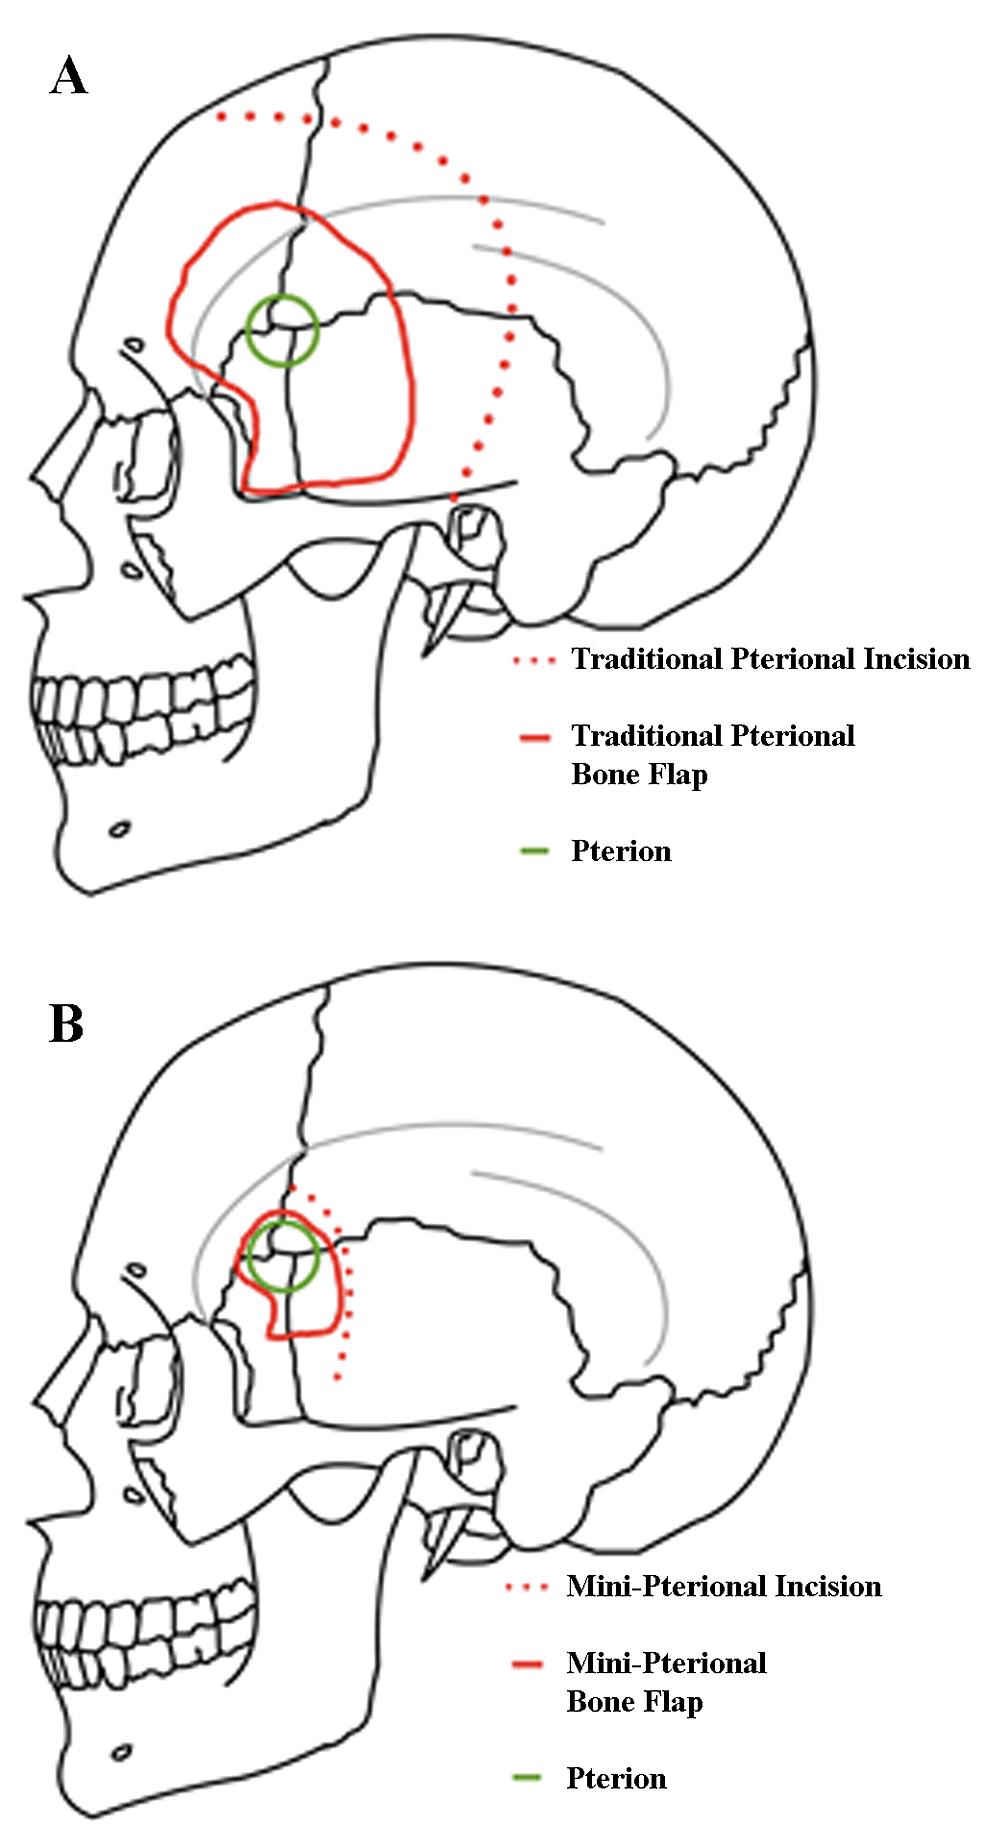 Cureus | Management of Intracranial Meningiomas Using Keyhole Techniques